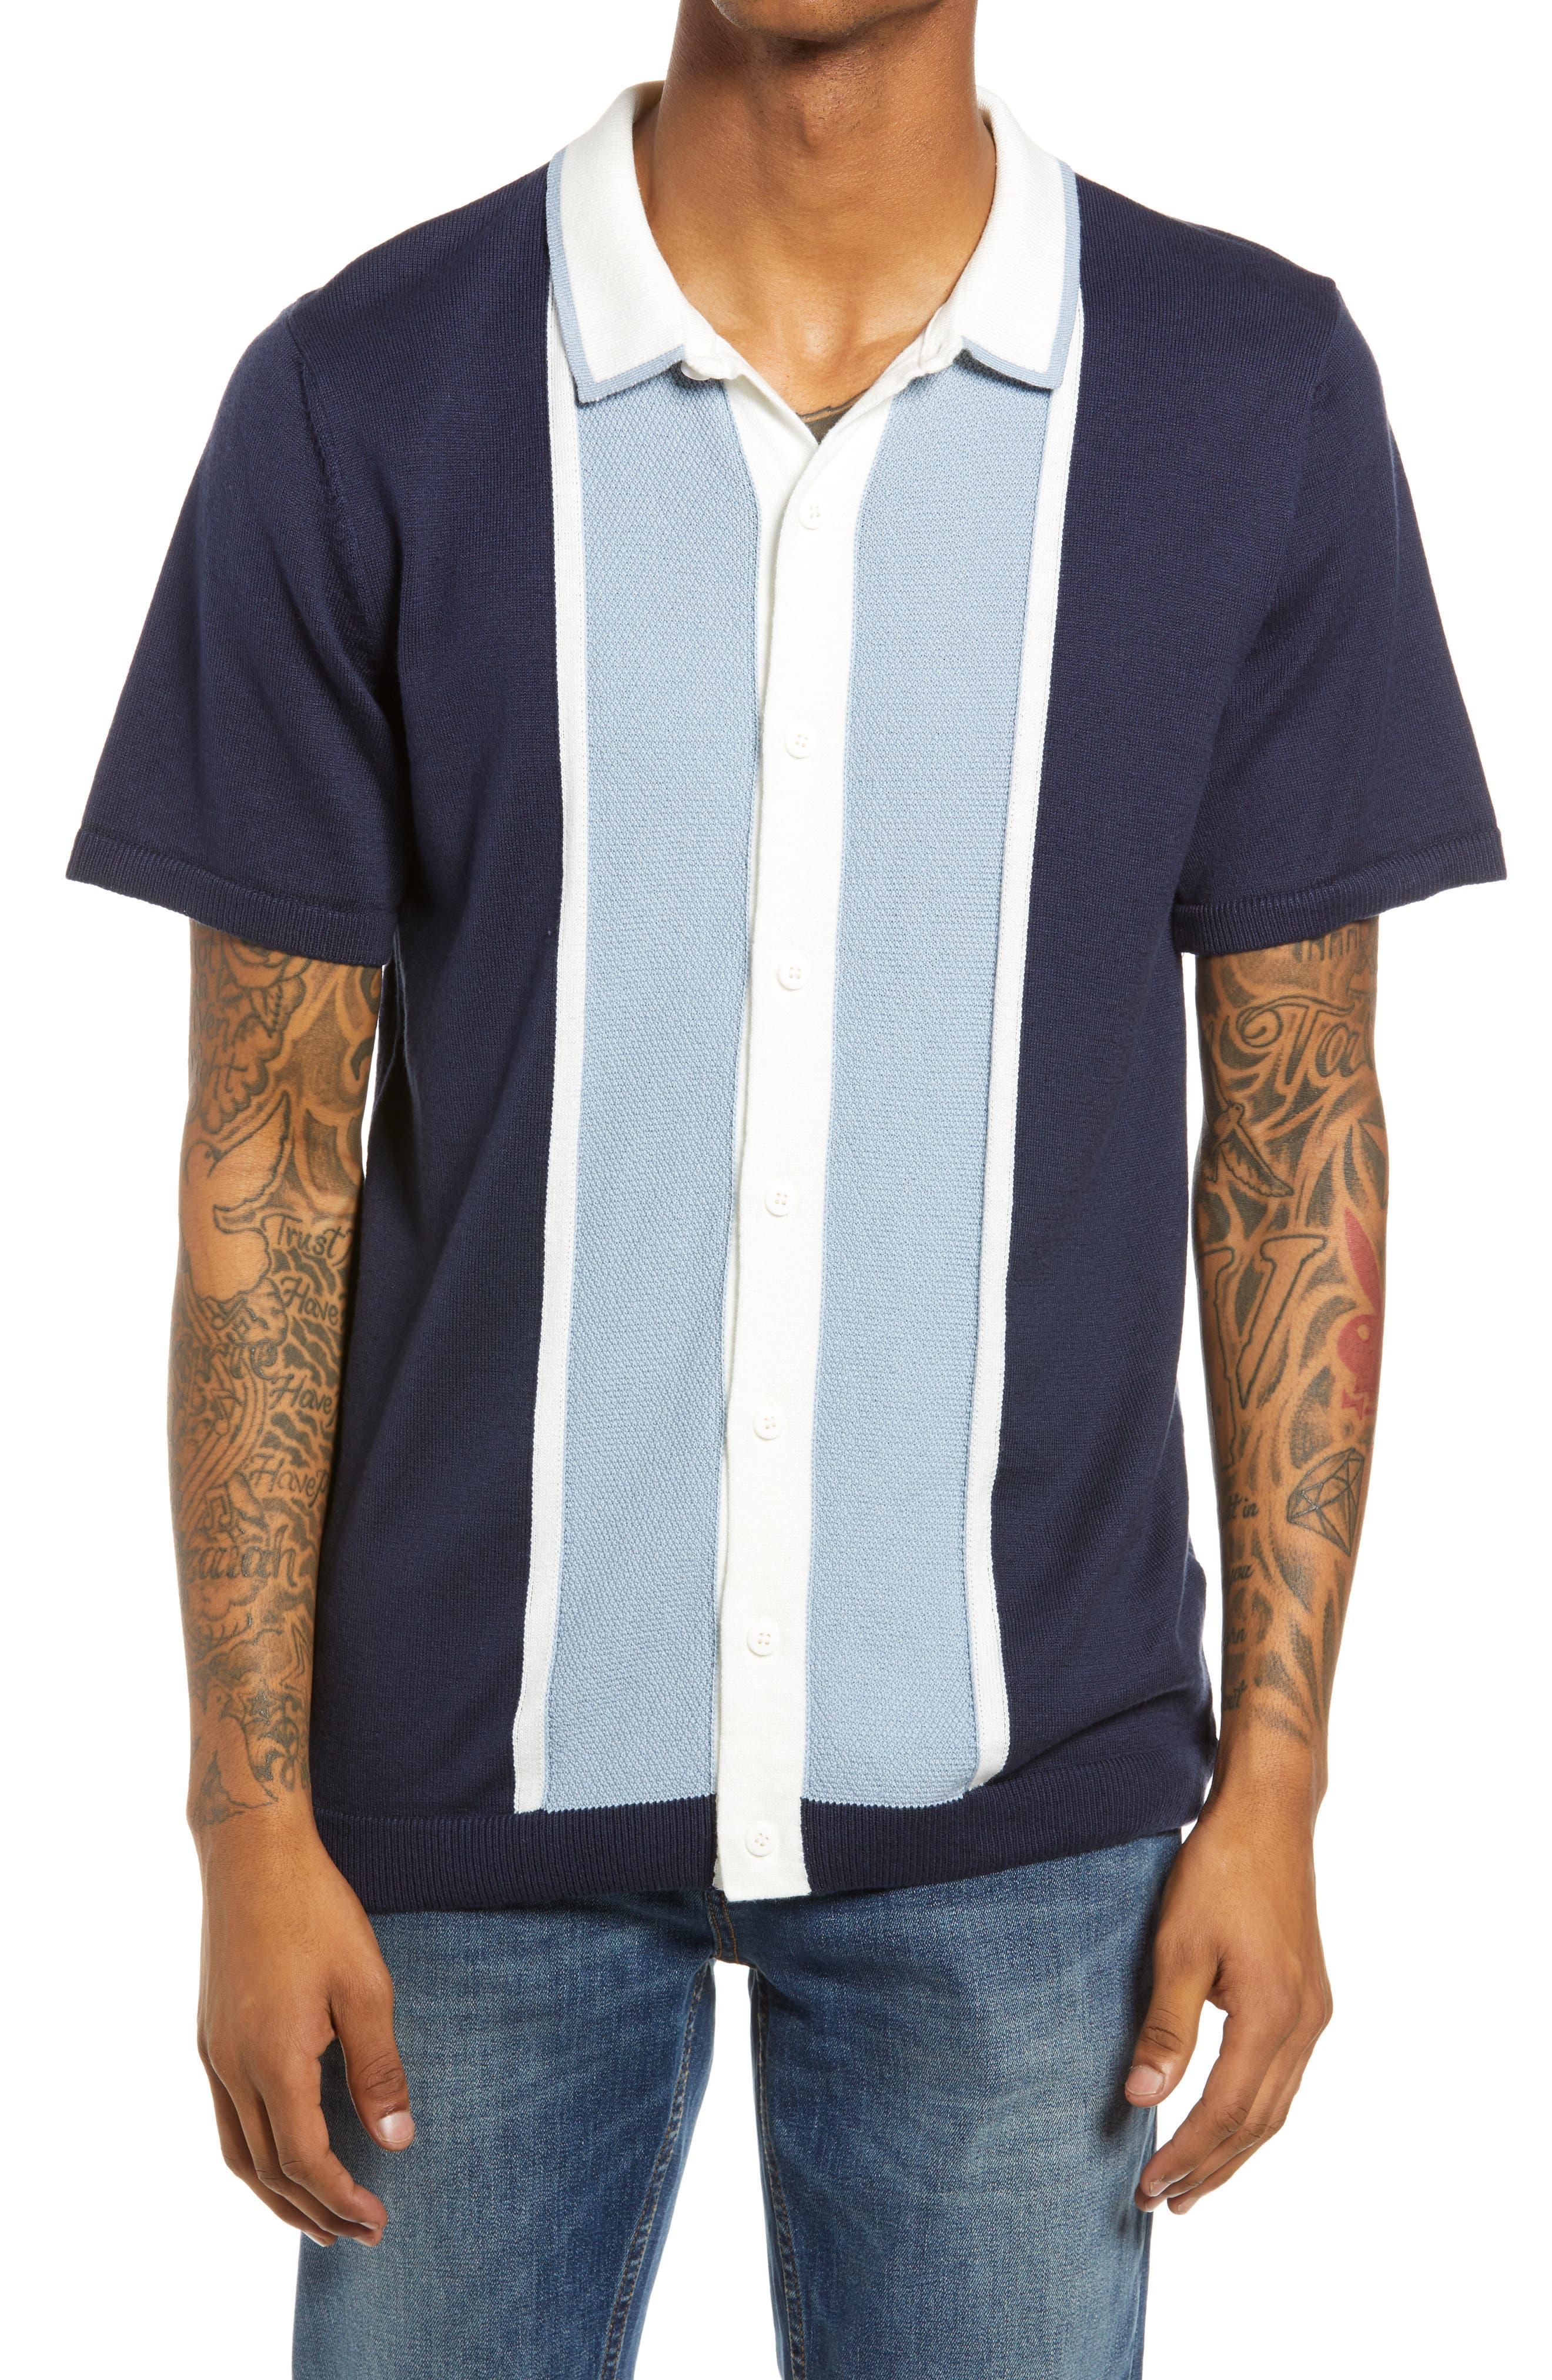 1960s Mens Shirts | 60s Mod Shirts, Hippie Shirts Mens Topman Colorblock Short Sleeve Button-Up Shirt Size X-Small - Blue $50.00 AT vintagedancer.com